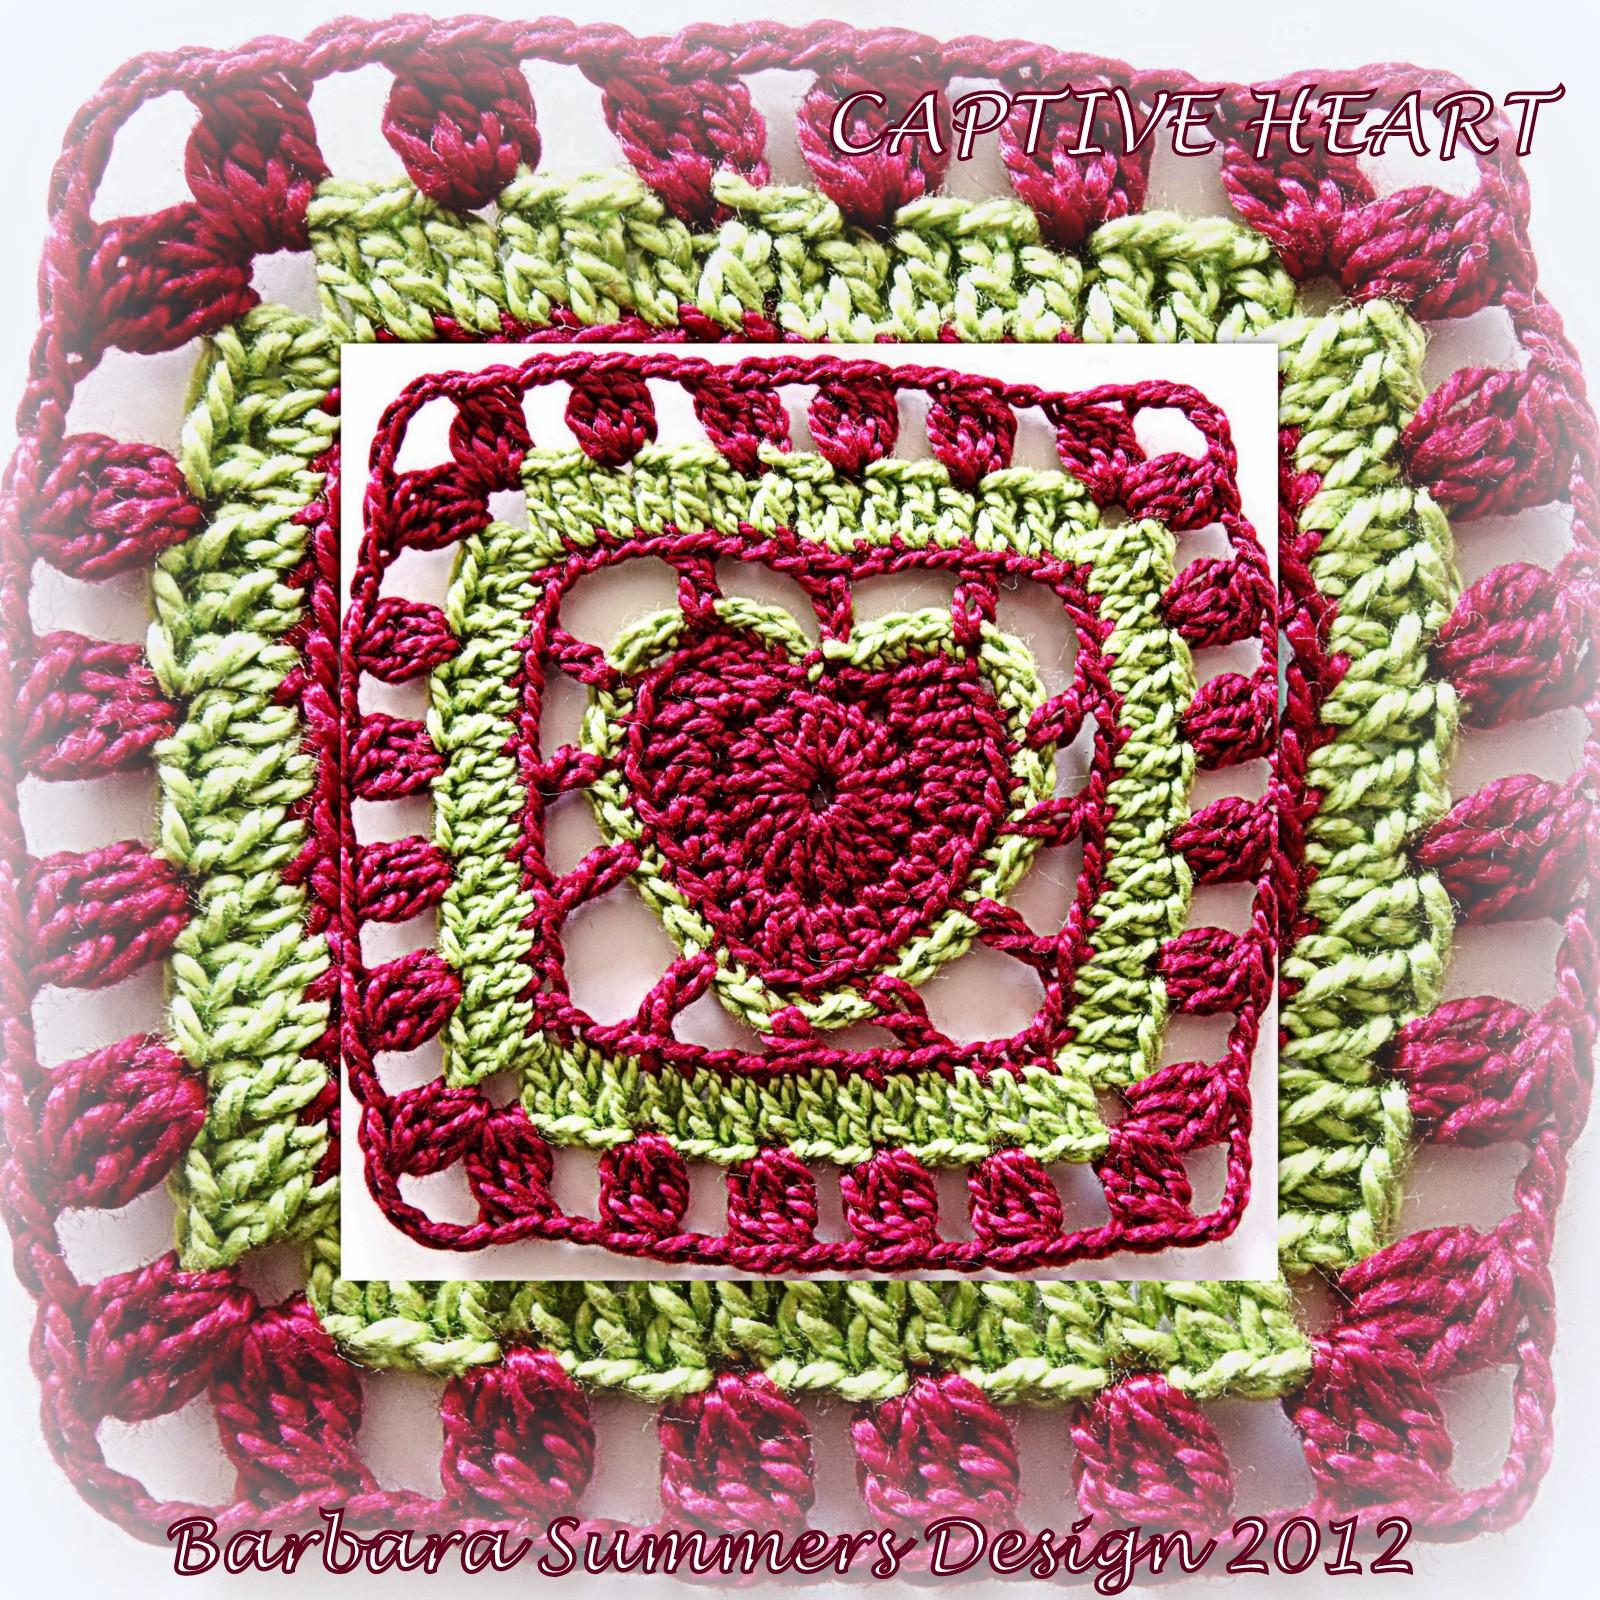 Microcknit creations crochet heart saga crochet patterns how to crochet hearts square hearts hearts afghan granny bankloansurffo Choice Image